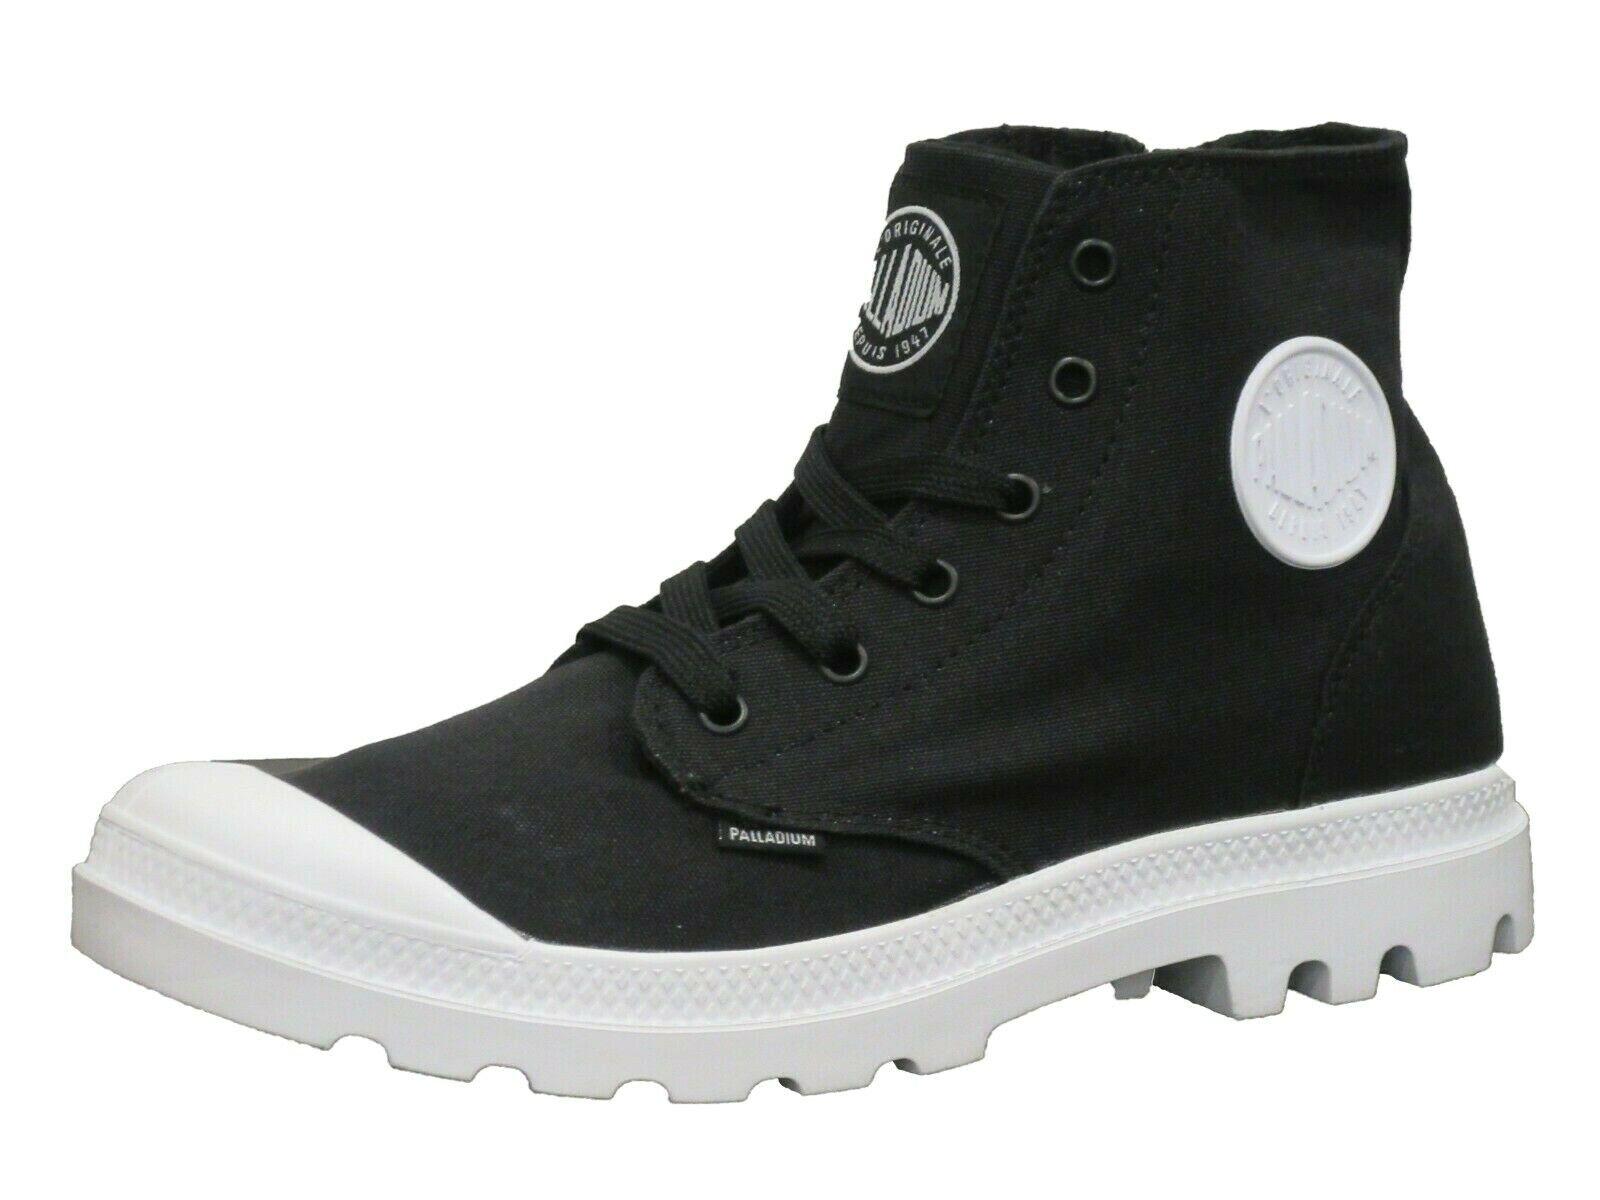 Palladium  white Hi Zipper Black Boots